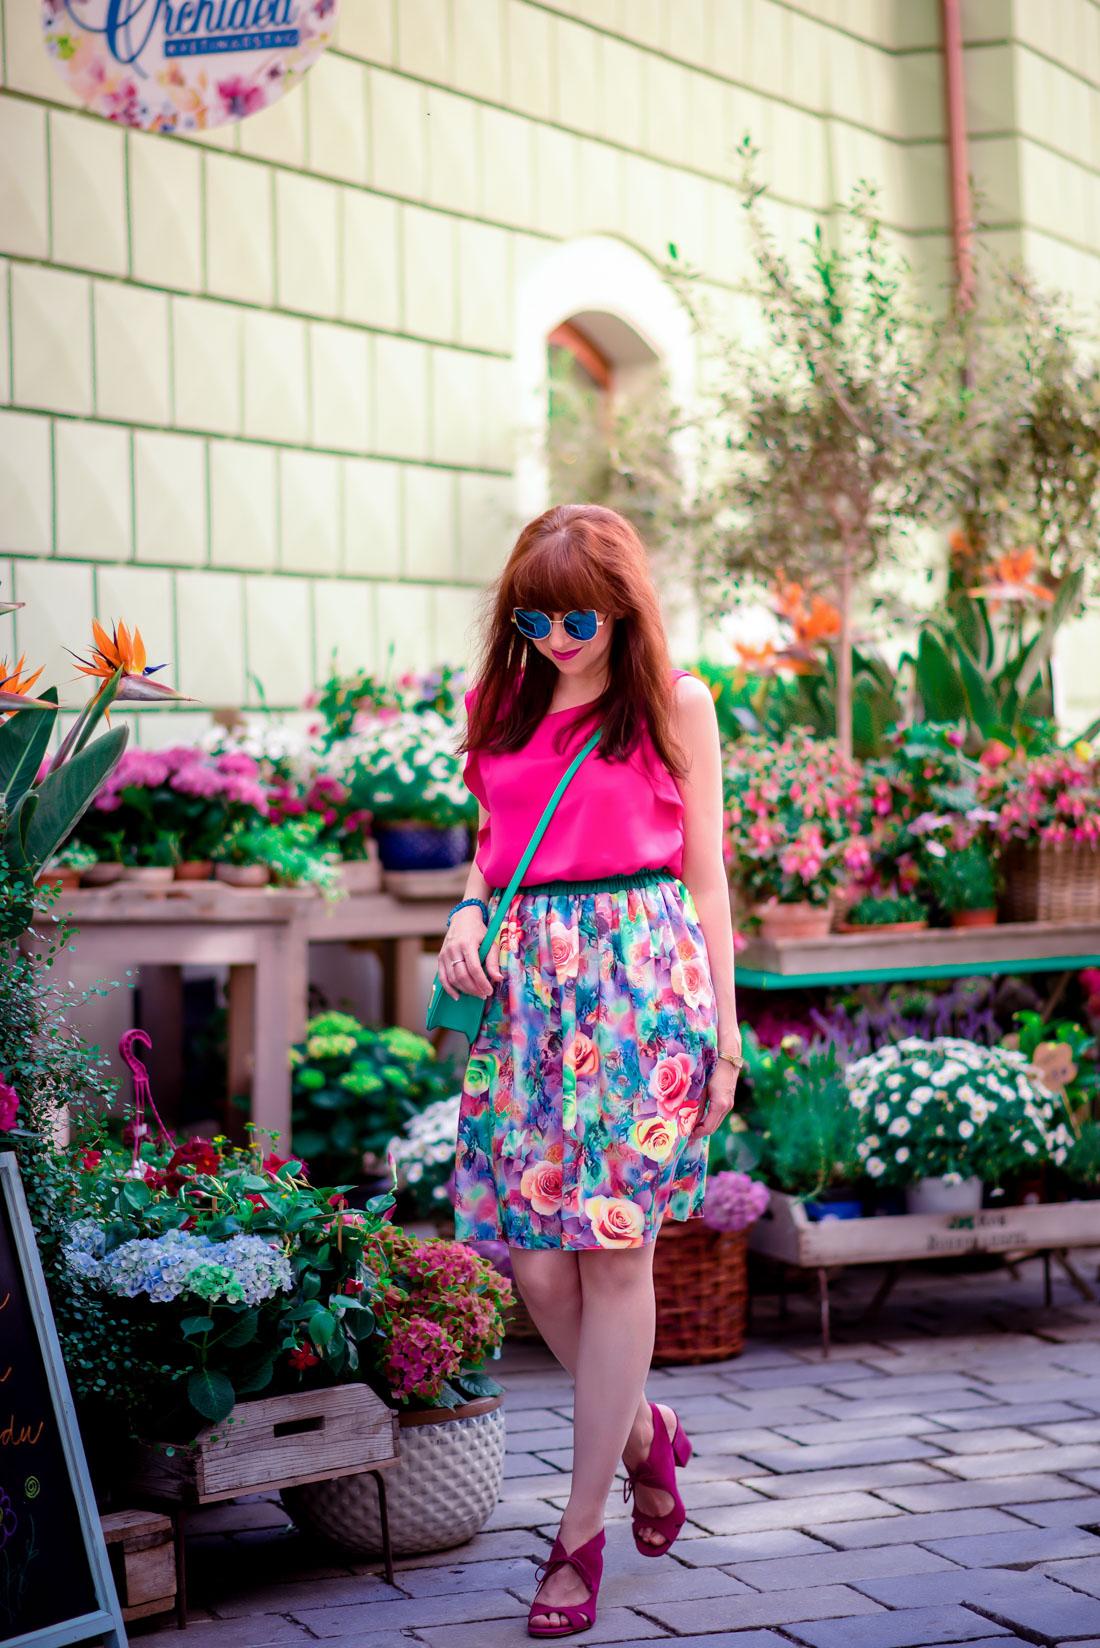 MAMA JE MAMA & KVETINOVÁ SUKŇA_Katharine-fashion is beautiful_blog 17_Kvetinová sukňa_Zelená kabelka Answear_Katarína Jakubčová_Fashion blogerka